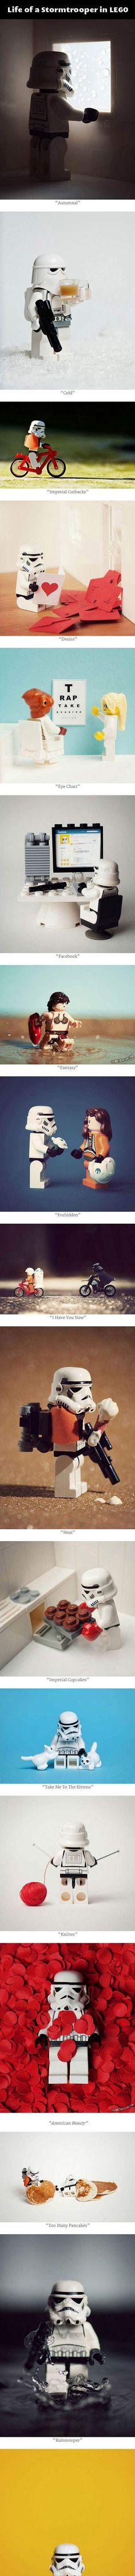 The Life ...  http://www.gzmoe.com/geek2.aspx